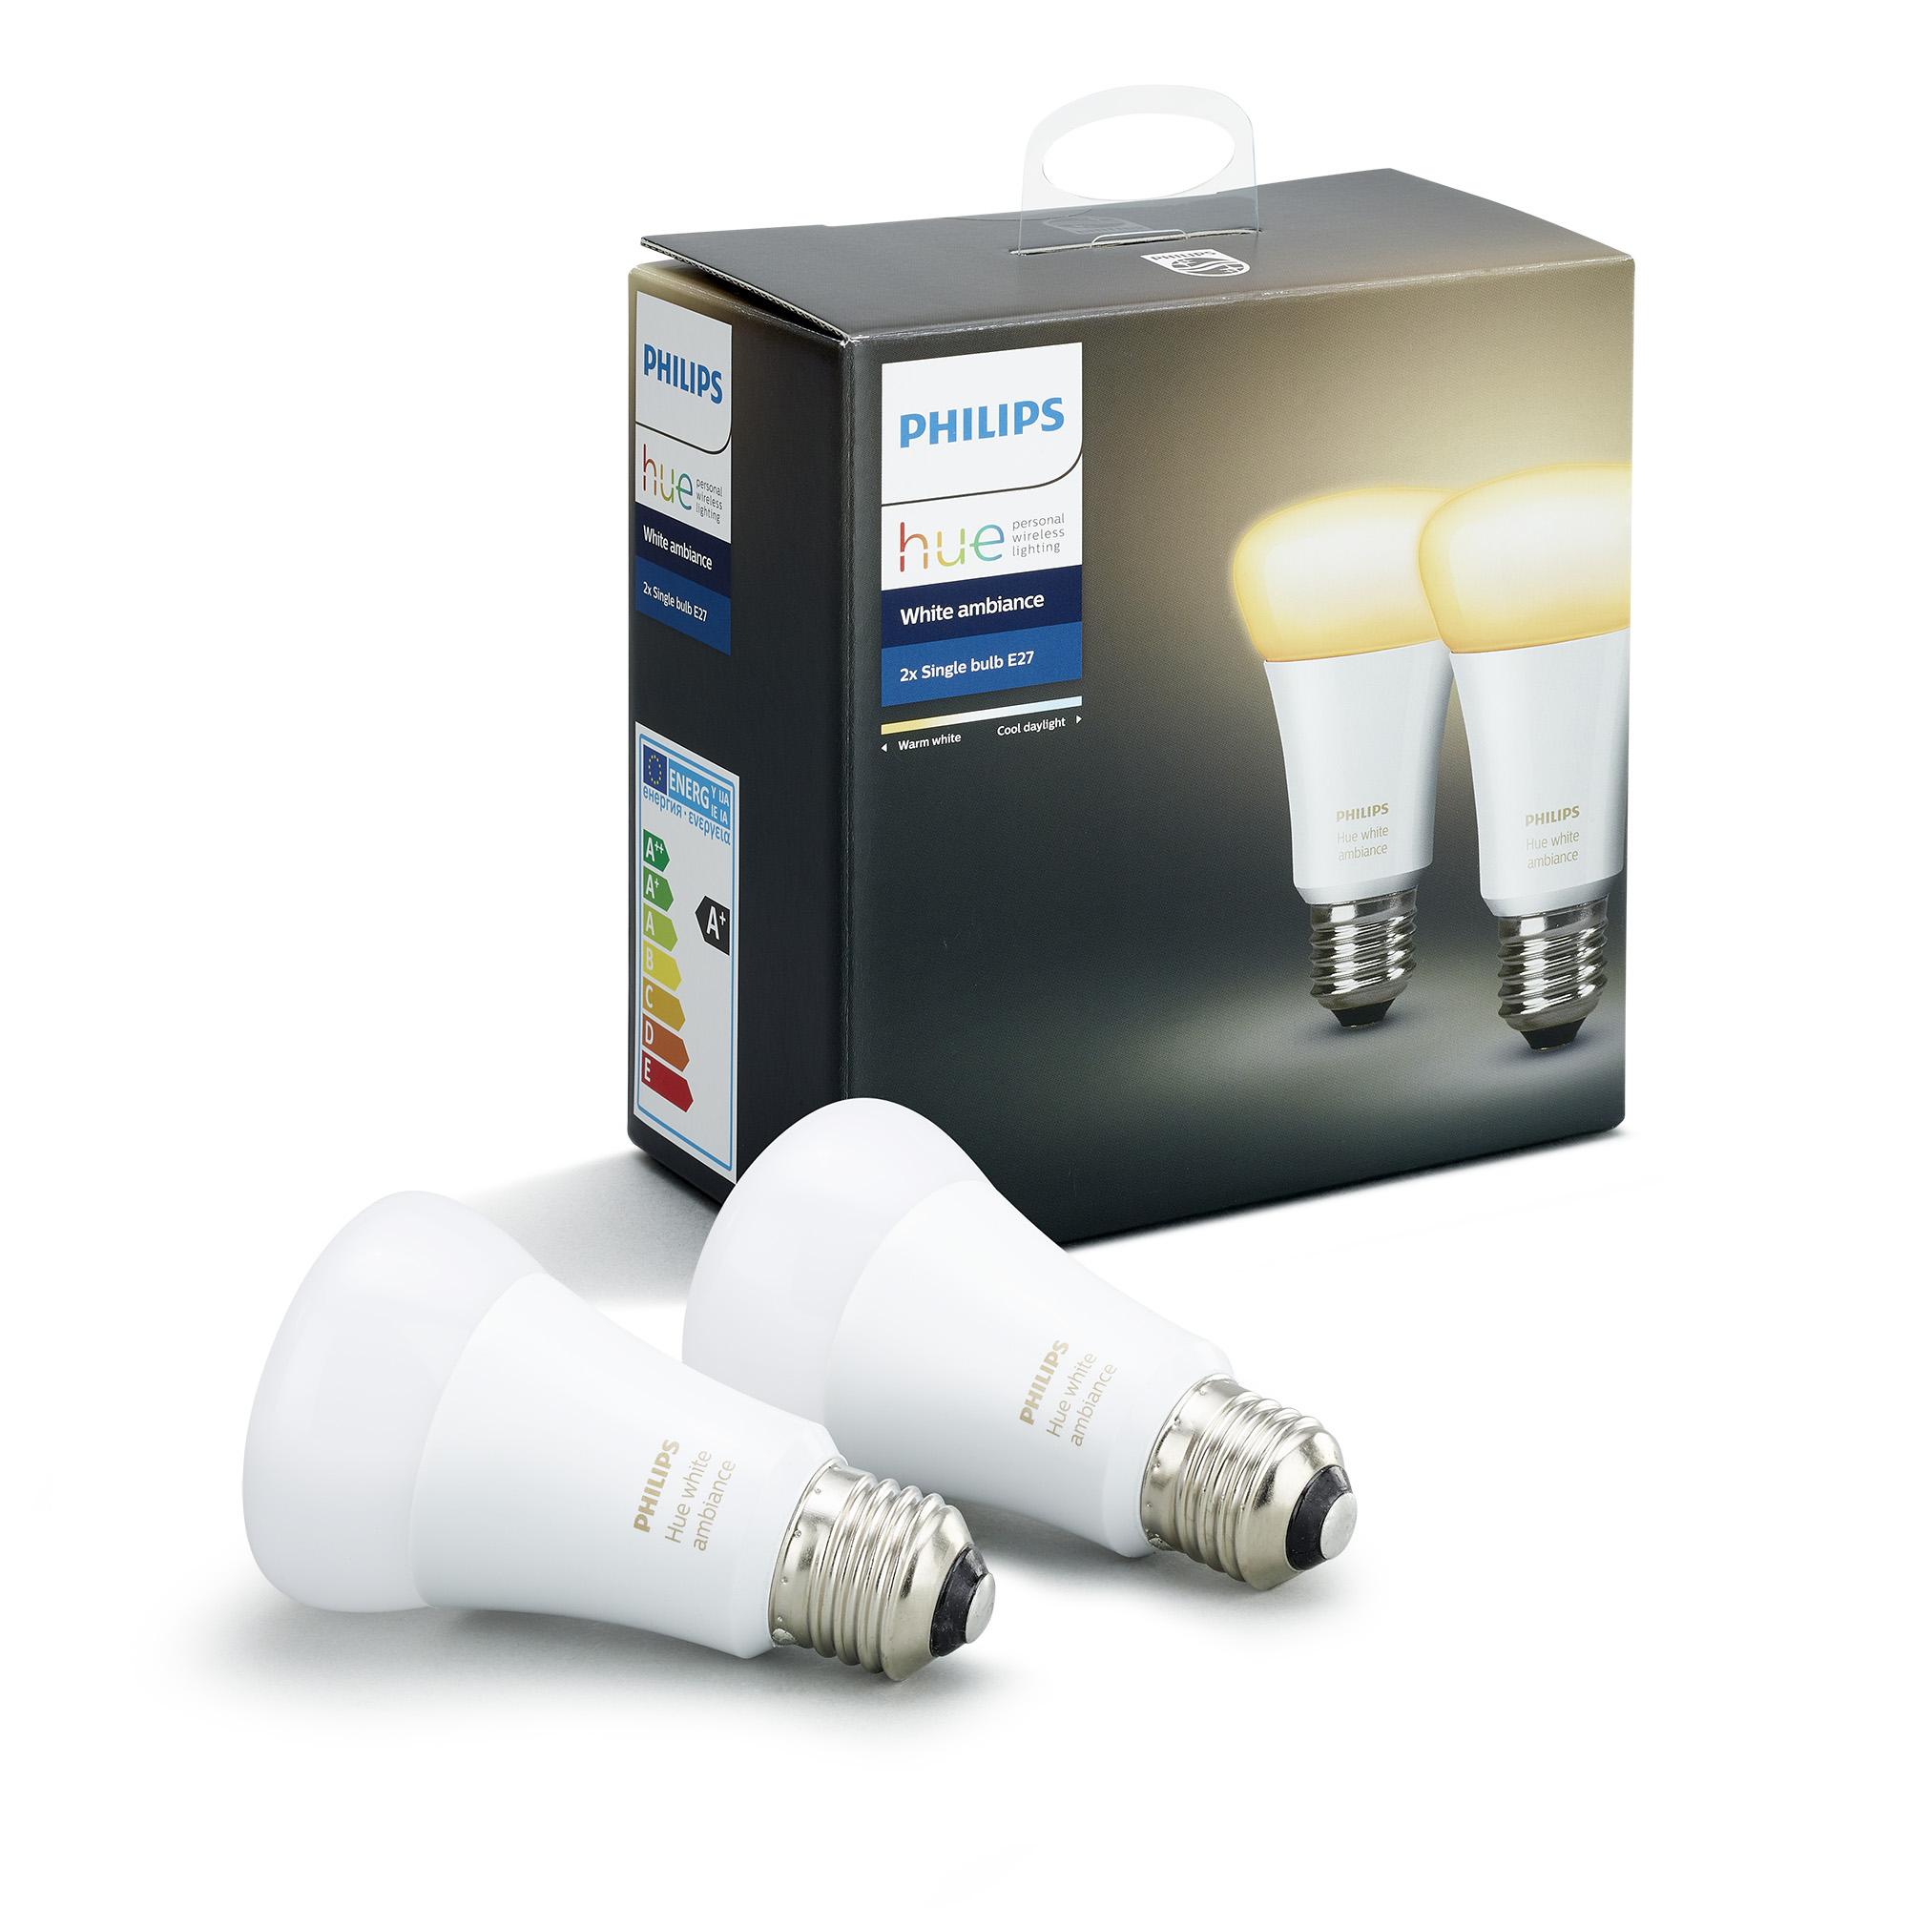 Philips Hue lamp standaard wit Ambiance E27 2 stuks